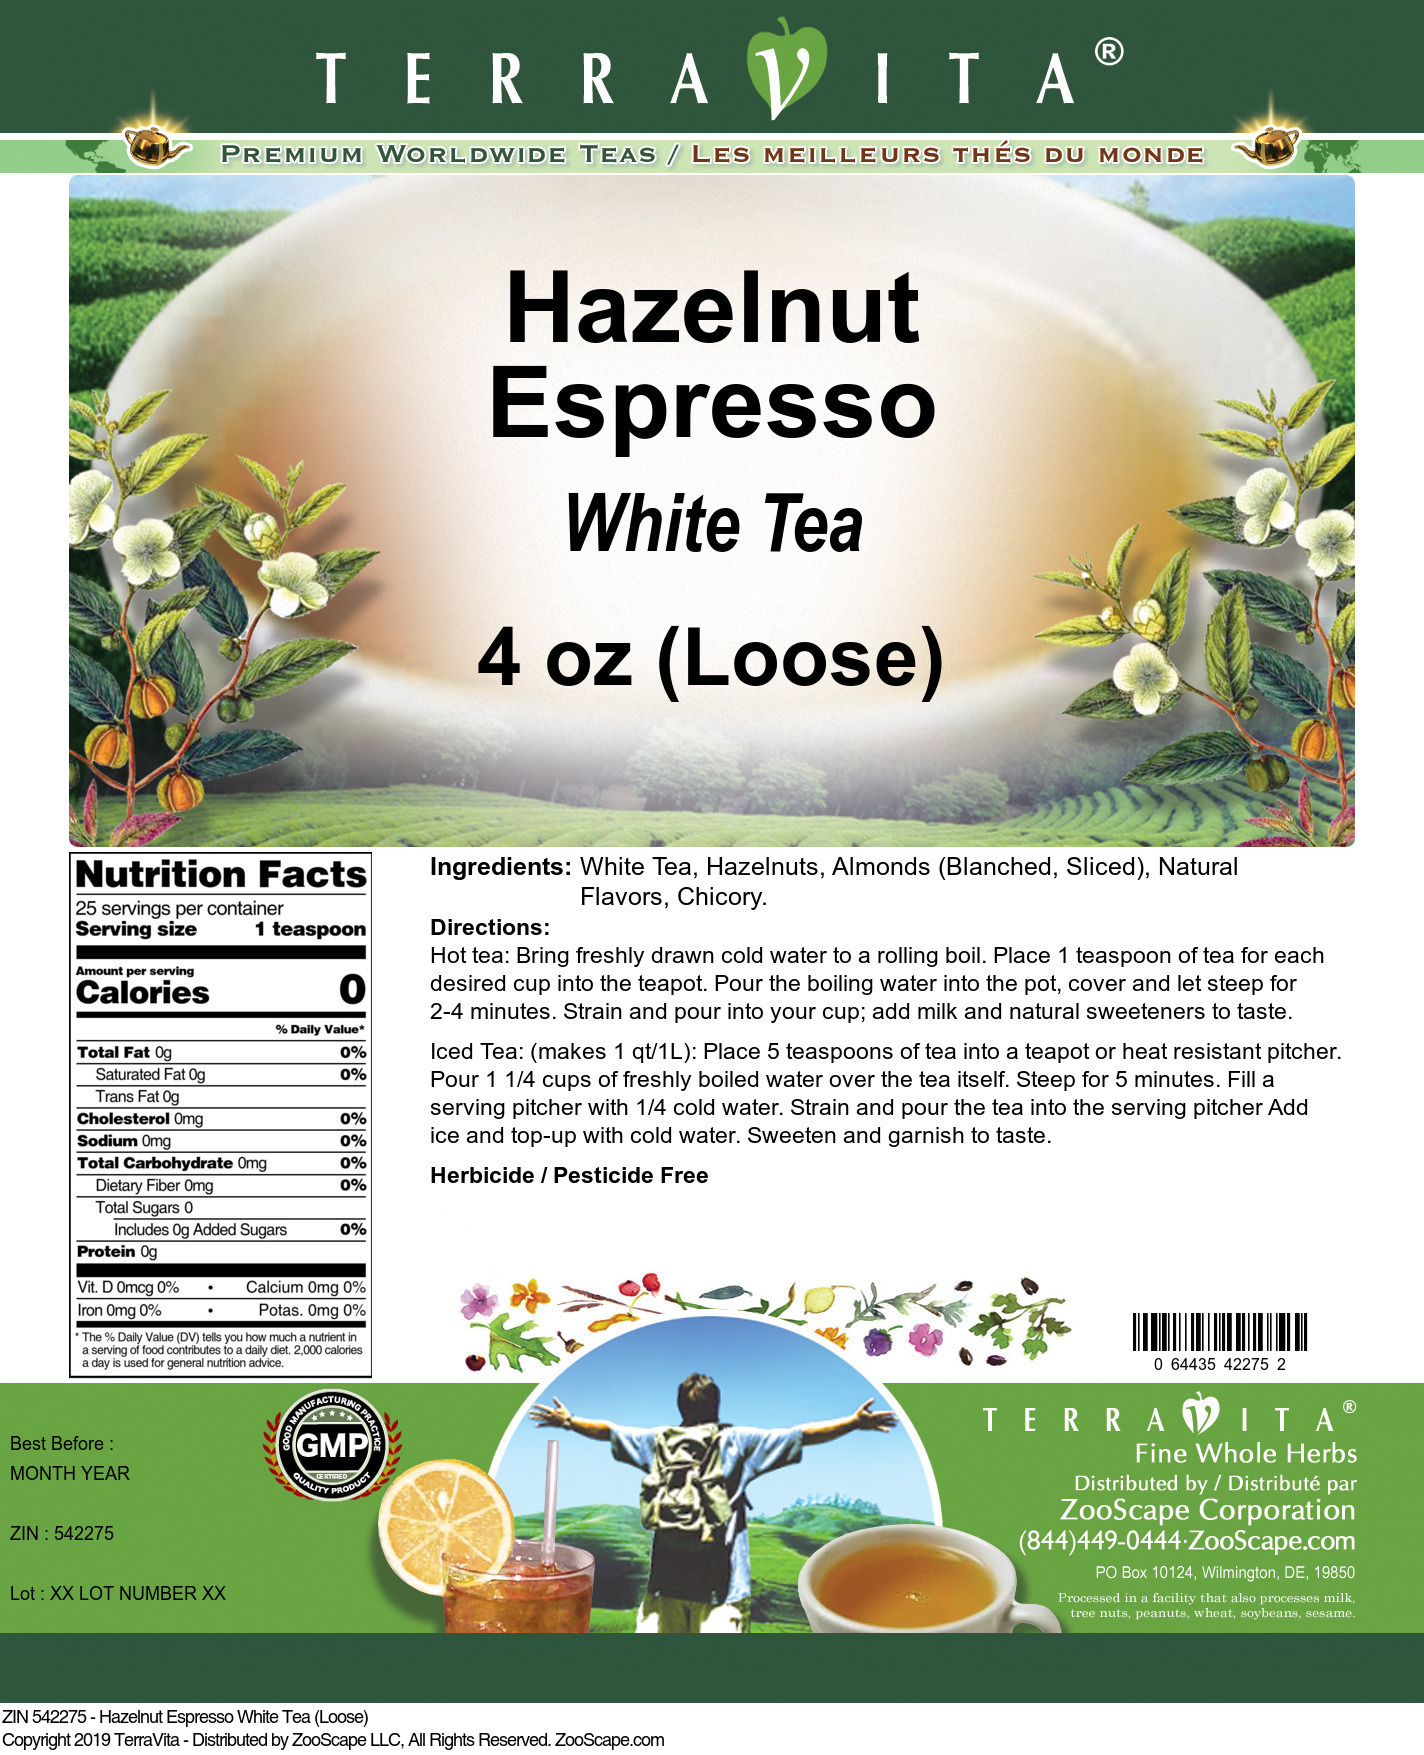 Hazelnut Espresso White Tea (Loose)